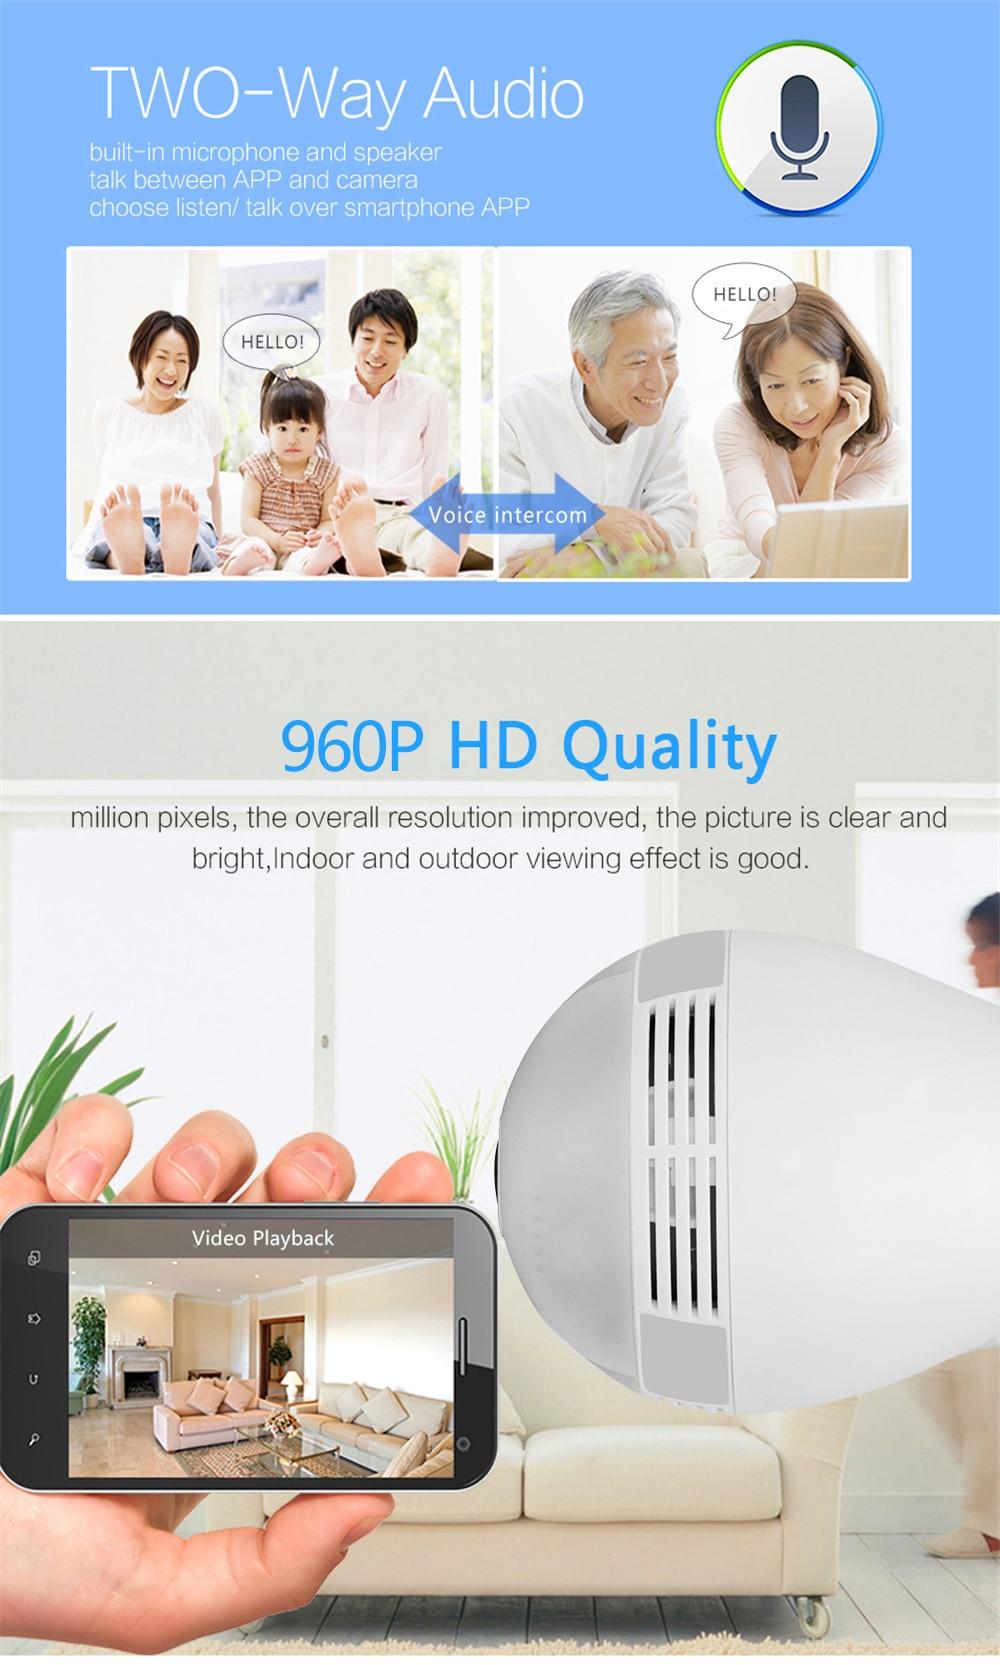 Wistino Wireless IP Camera Bulb Light WiFi 960P VR Panoramic FishEye Lamp Cameras CCTV Security Home Baby Monitor 360 Degree Night Vision (6)